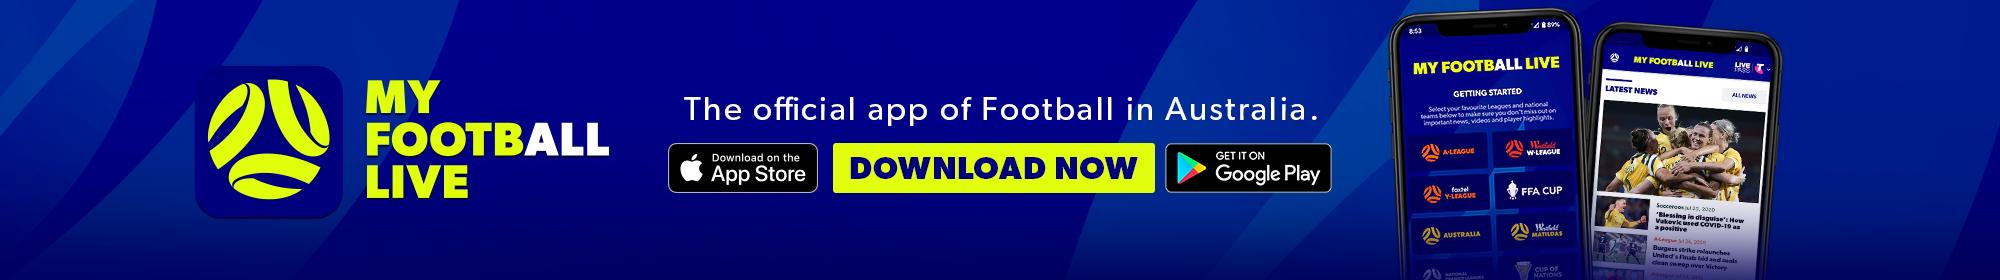 My Football Live app thin banner 2020